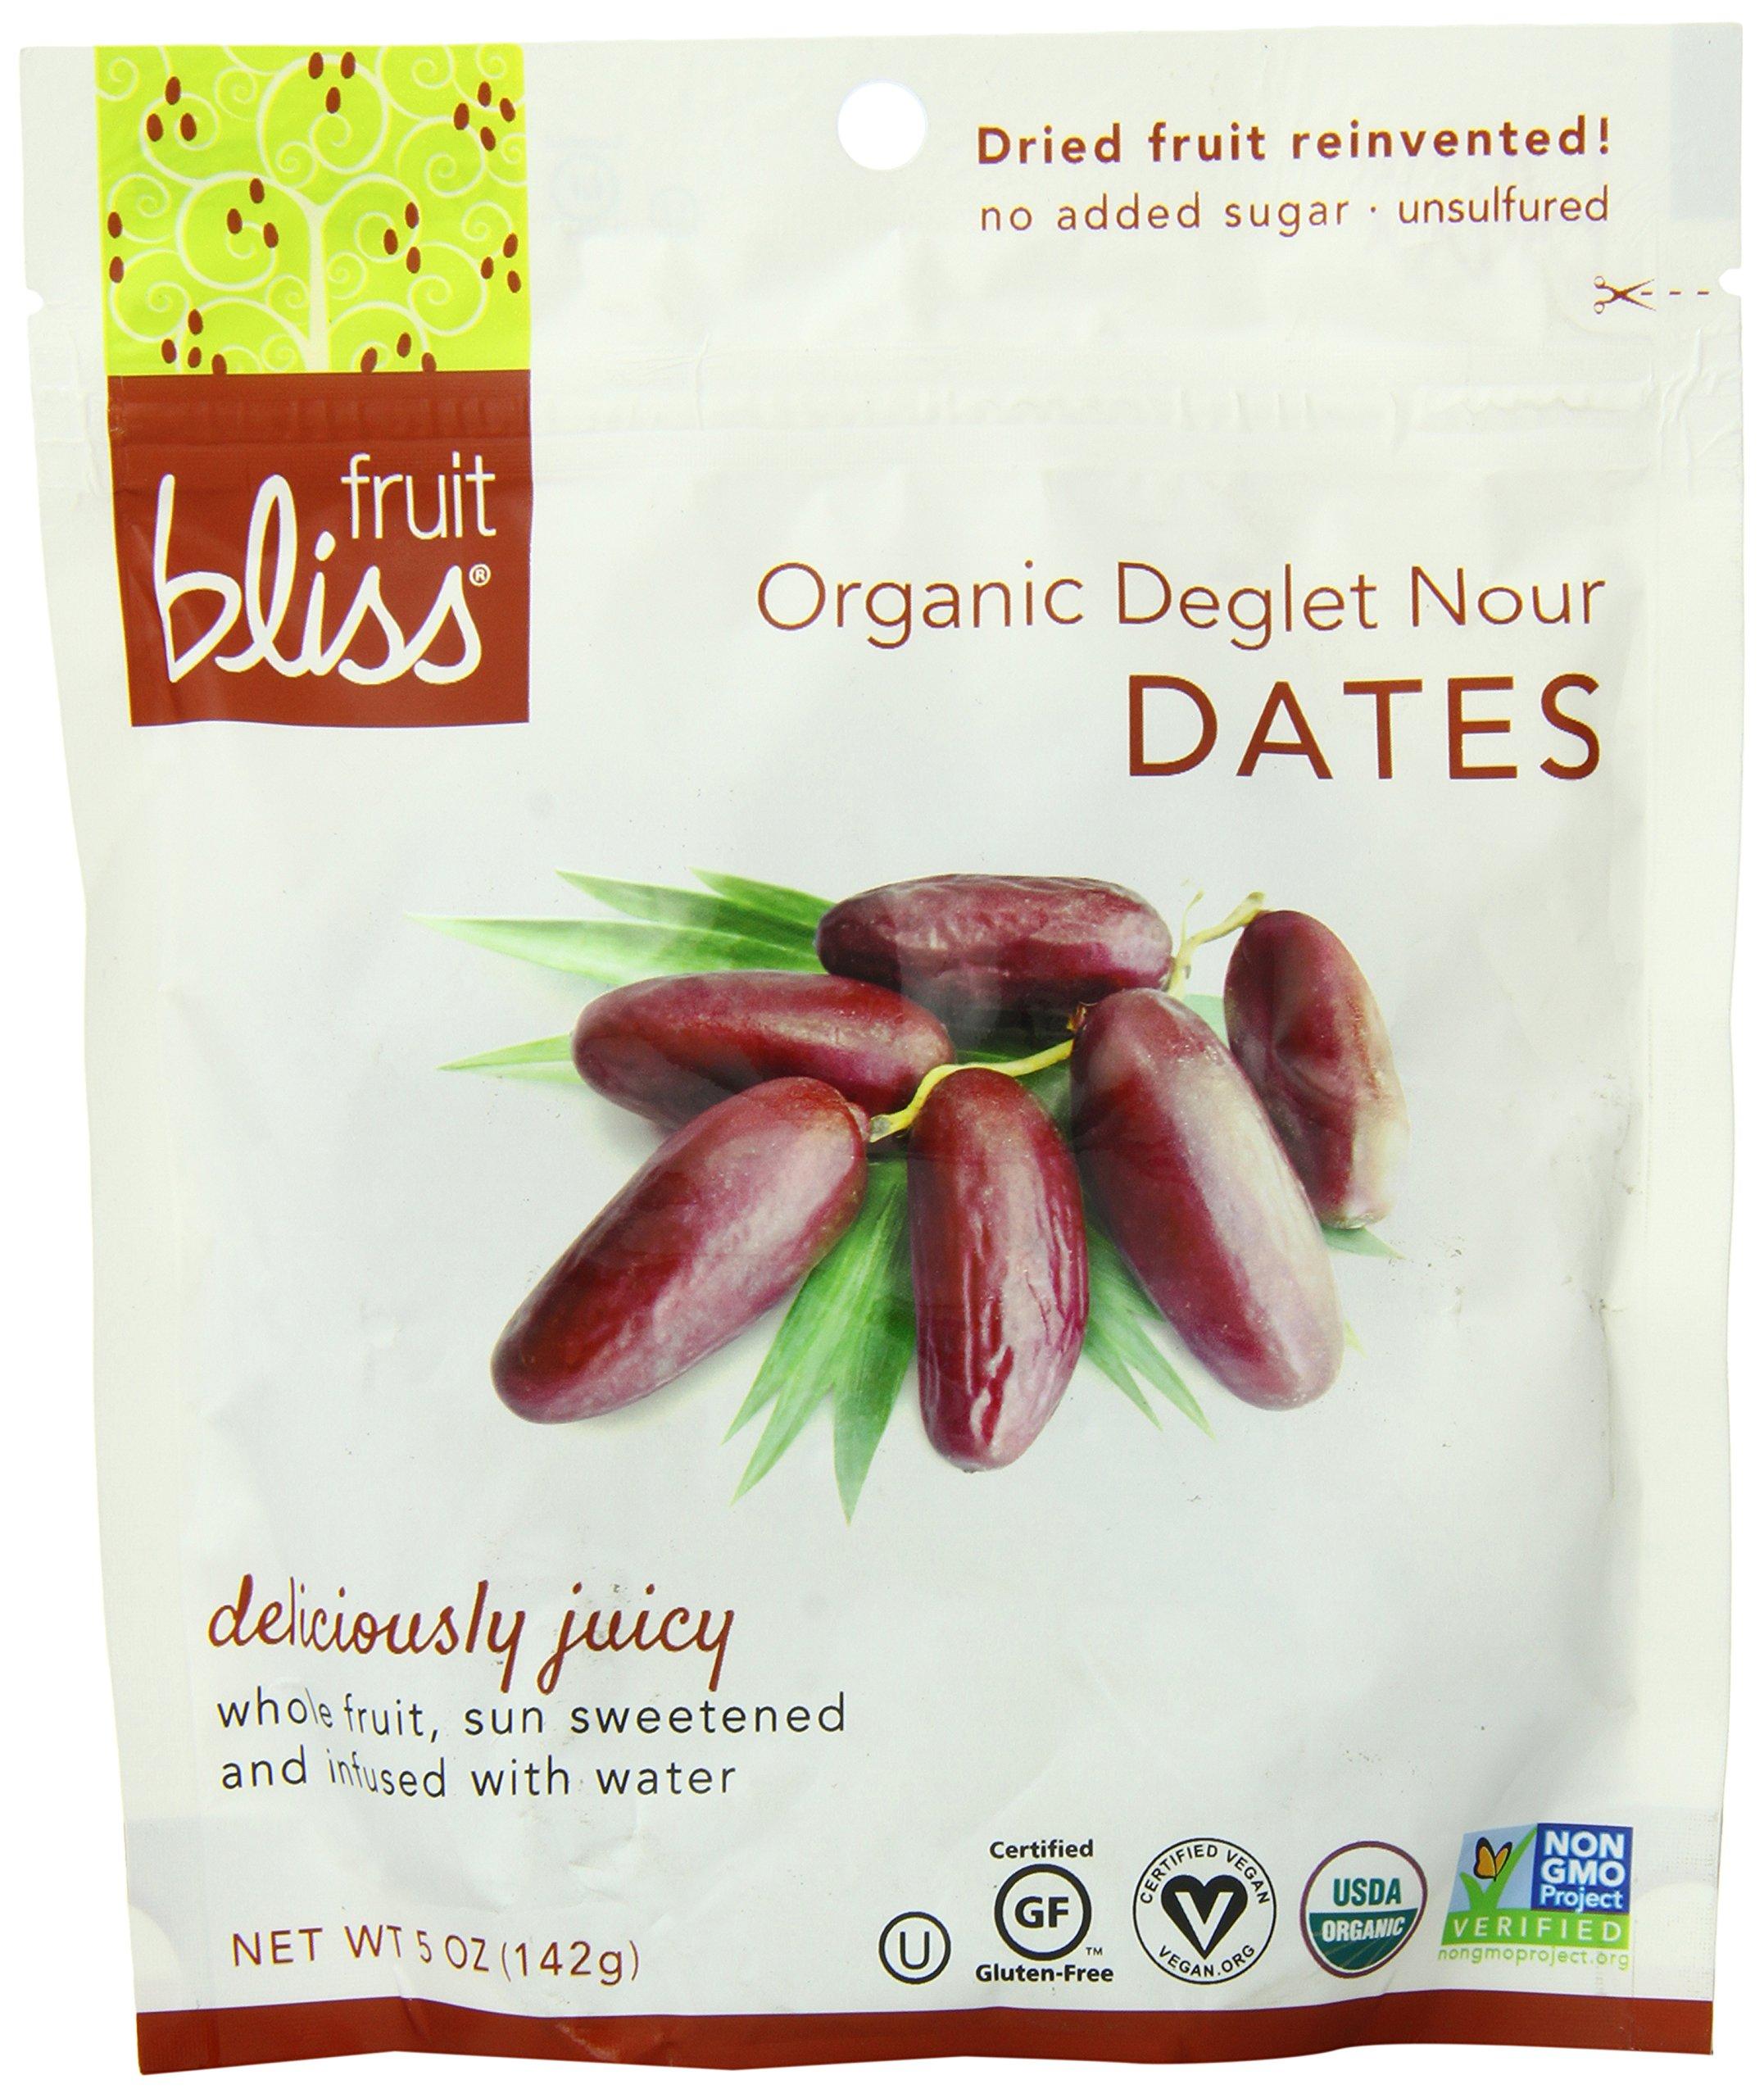 Fruit Bliss Organic Deglet Nour Dates - Date - 5 oz